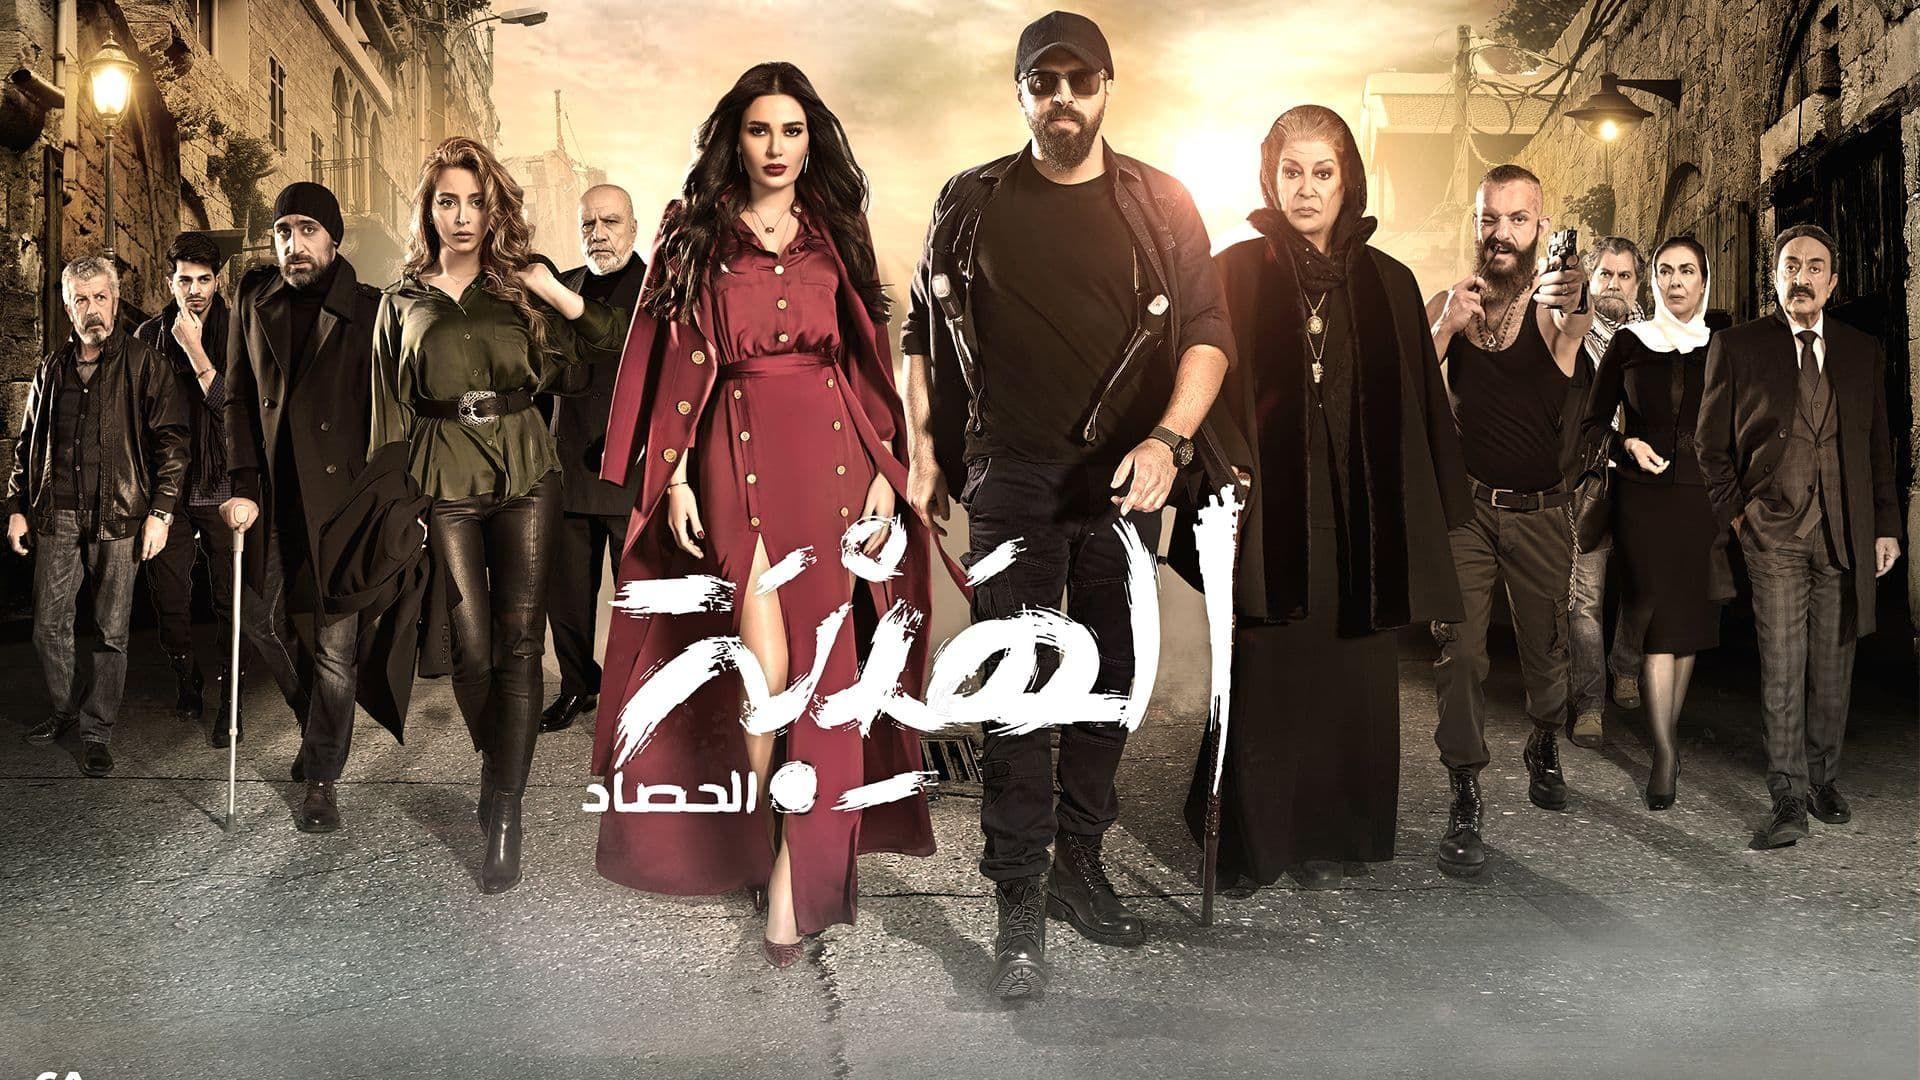 kostenloser download movie sexy libanon